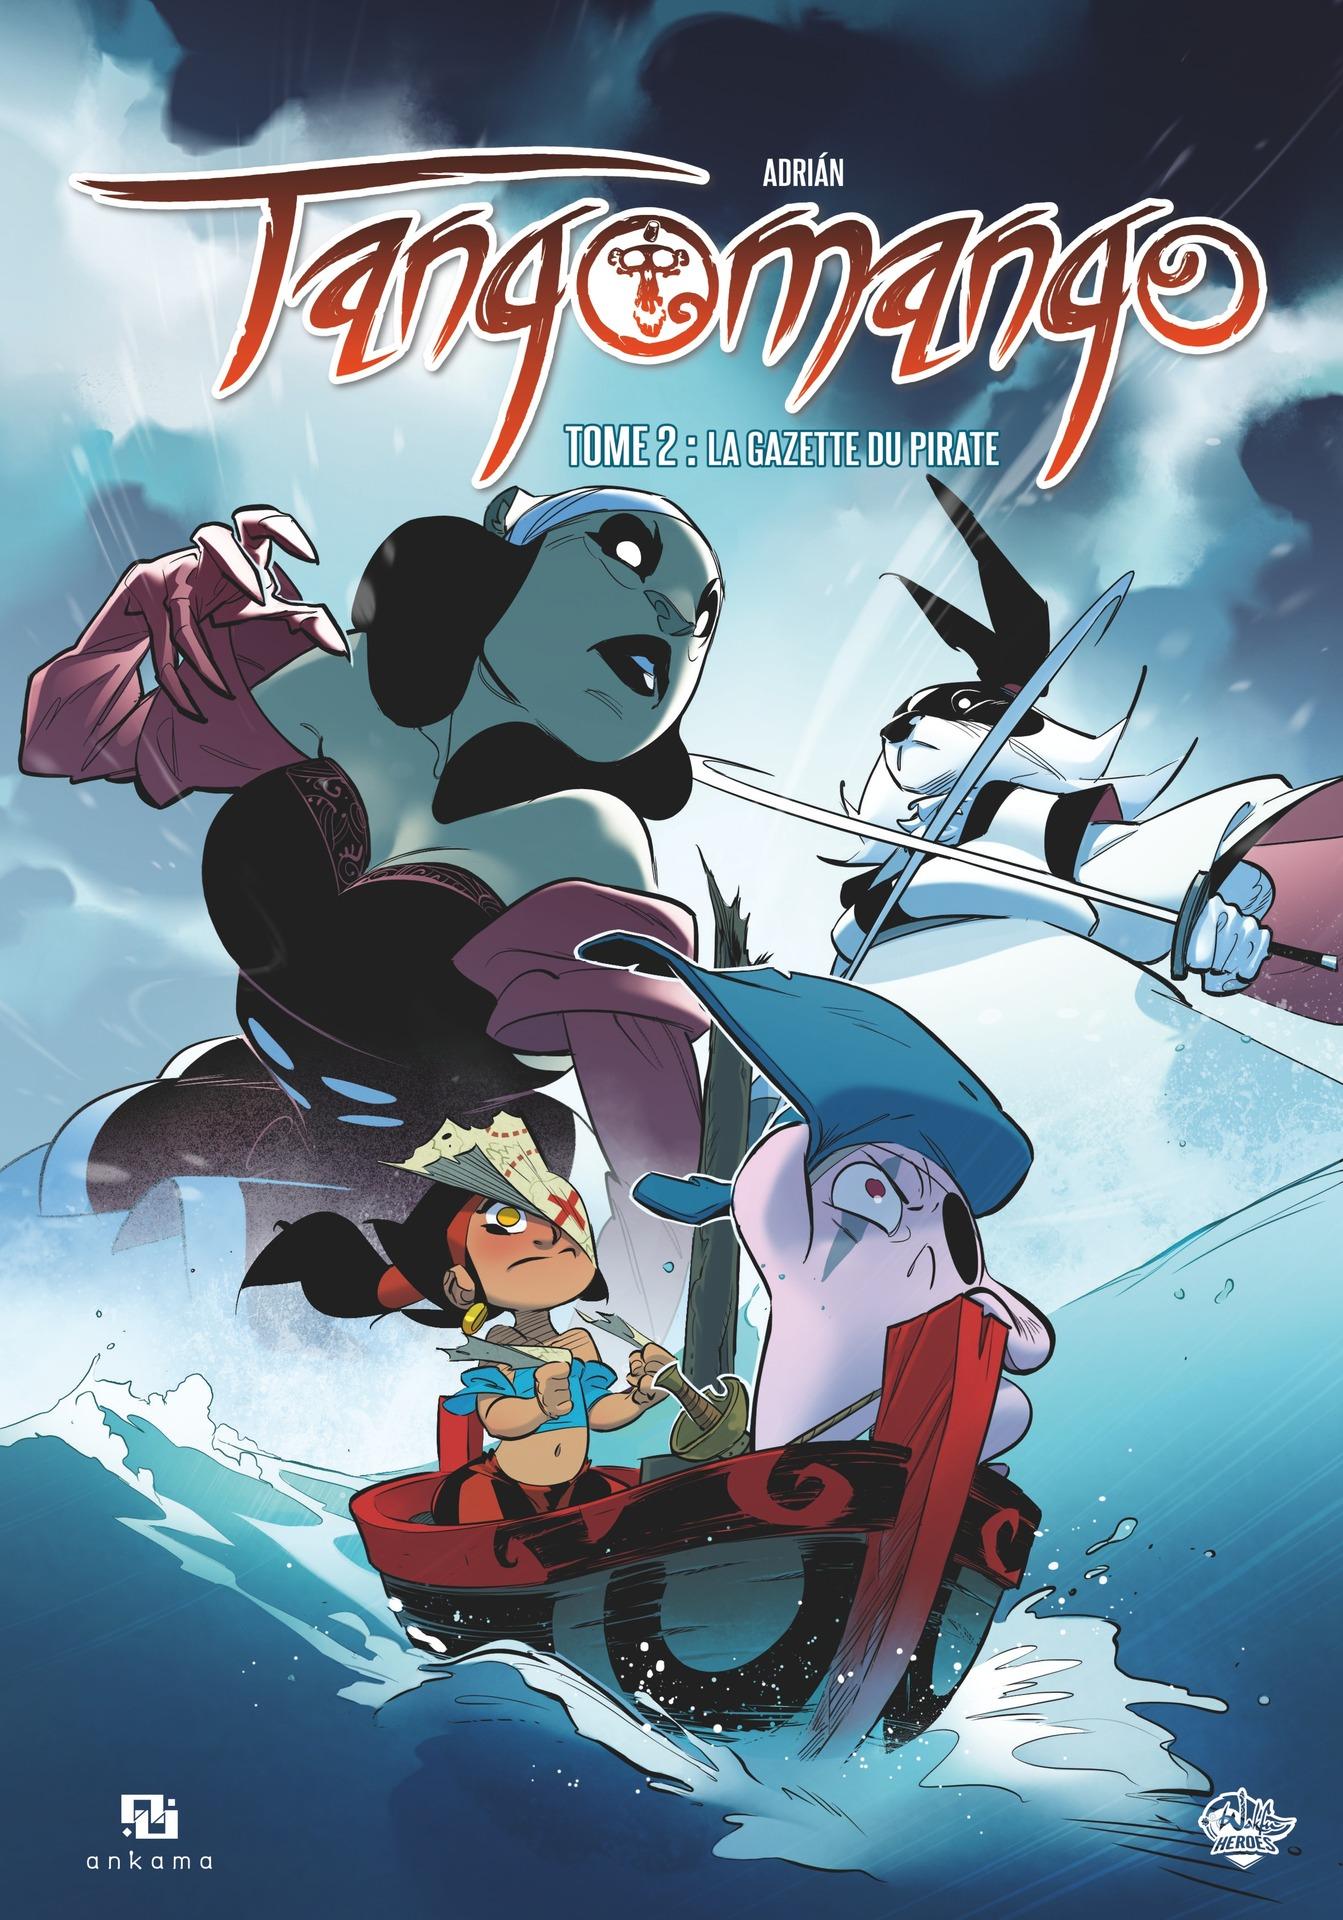 Tangomango - Tome 2 - La Gazette du pirate |